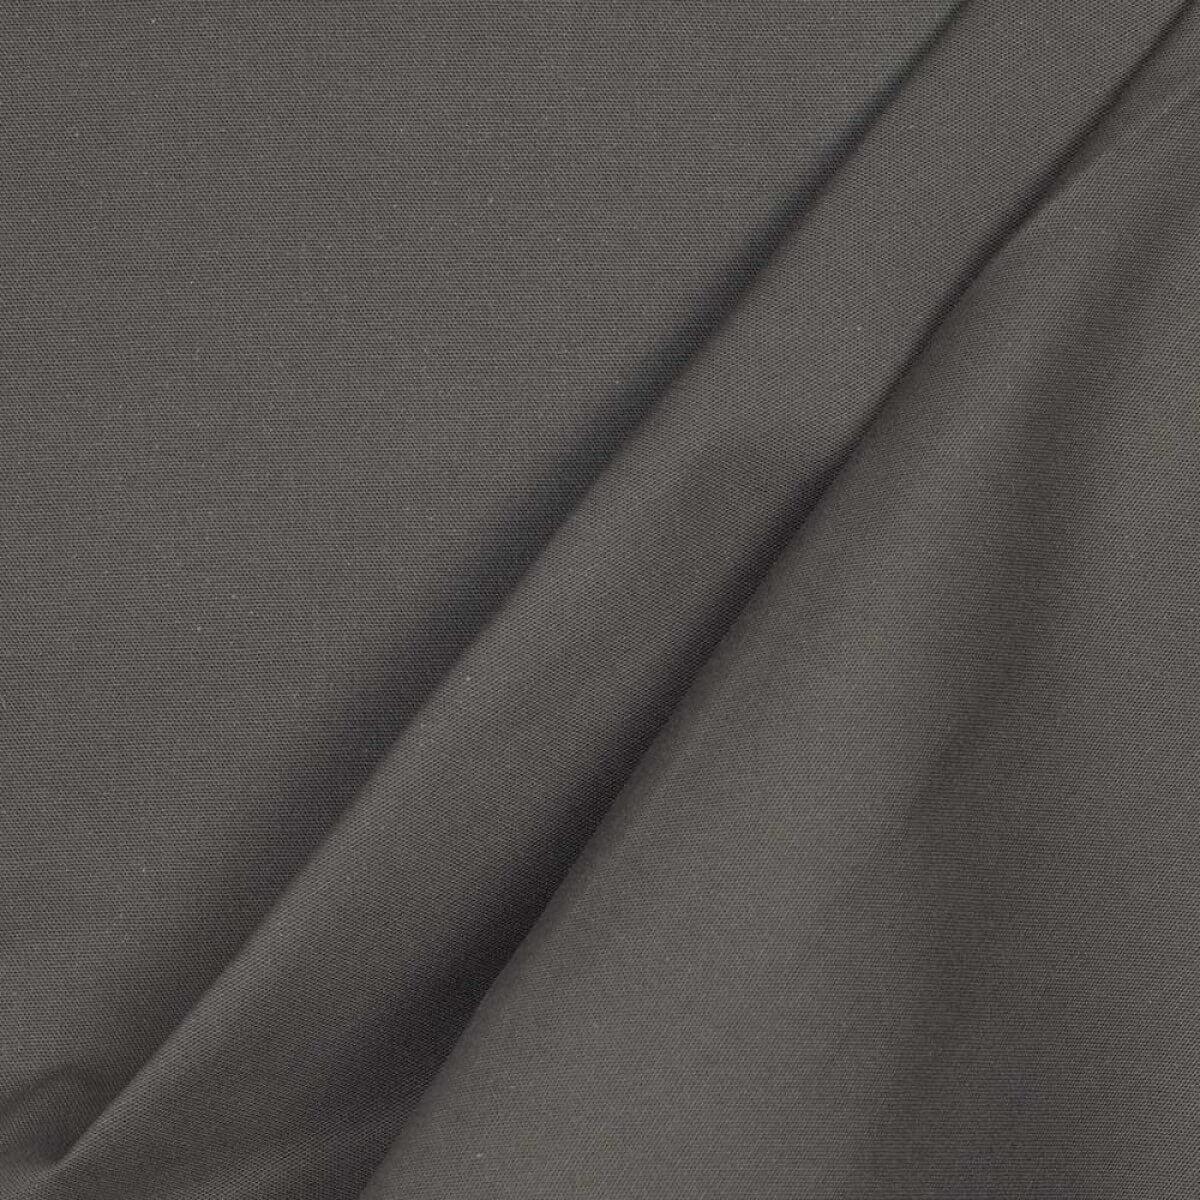 stunning tissu exterieur with tissu exterieur. Black Bedroom Furniture Sets. Home Design Ideas